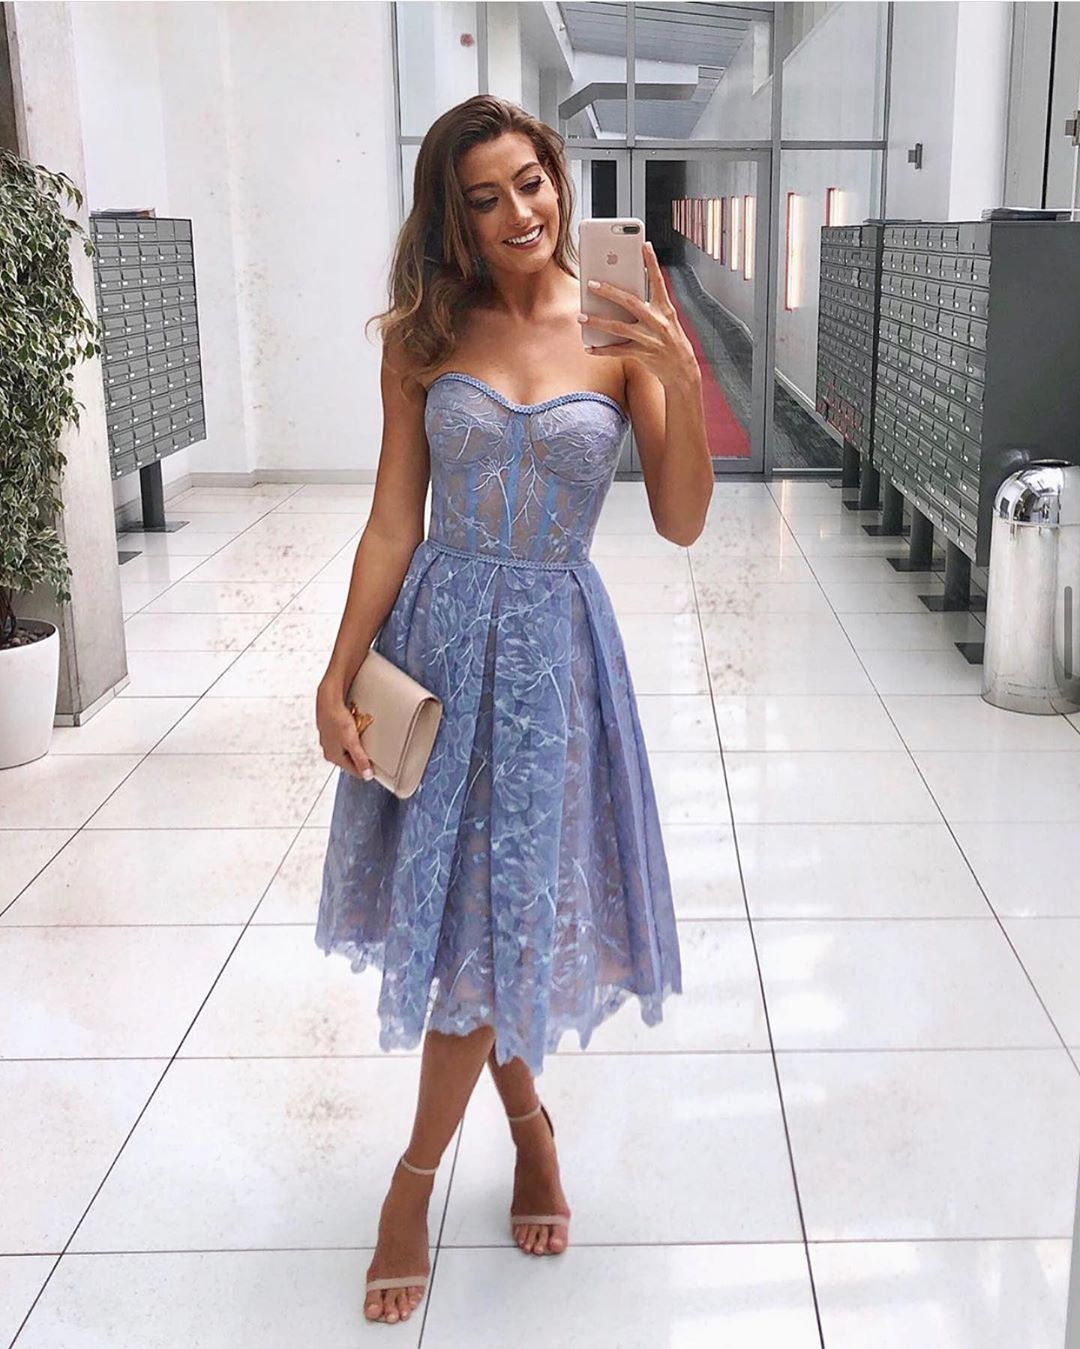 OLIVIA BLUE  Floral Embroidered Midi Dress  NADINE MERABI in 18 ...